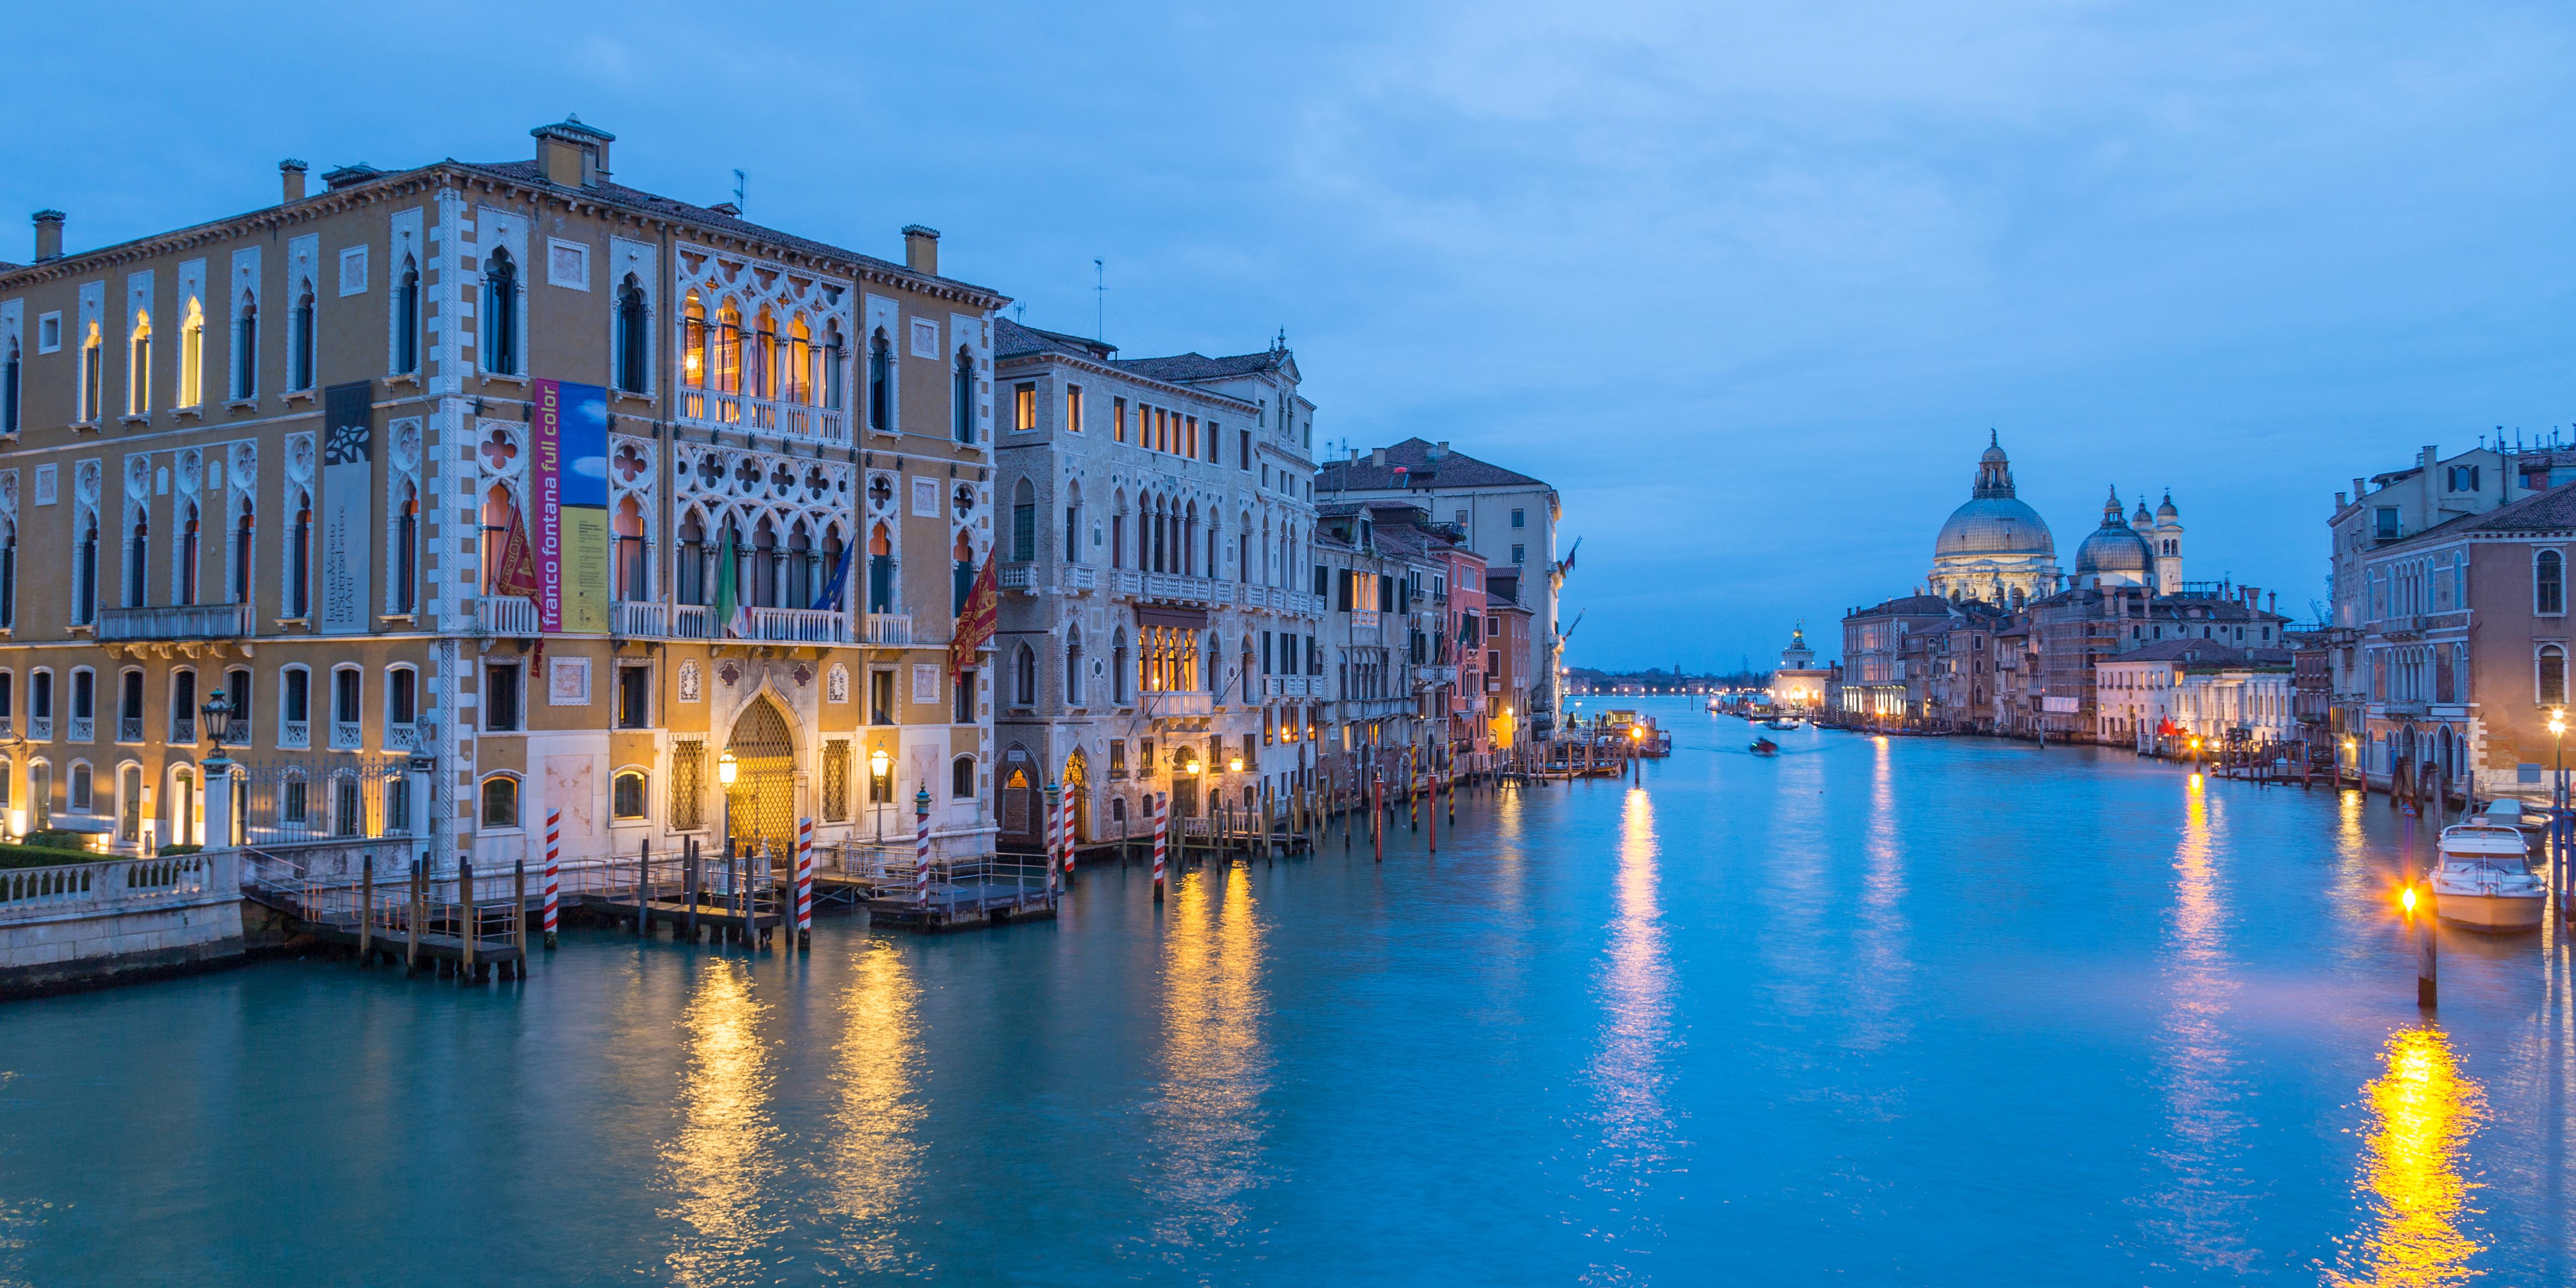 Canale Grande, Venice, Italy